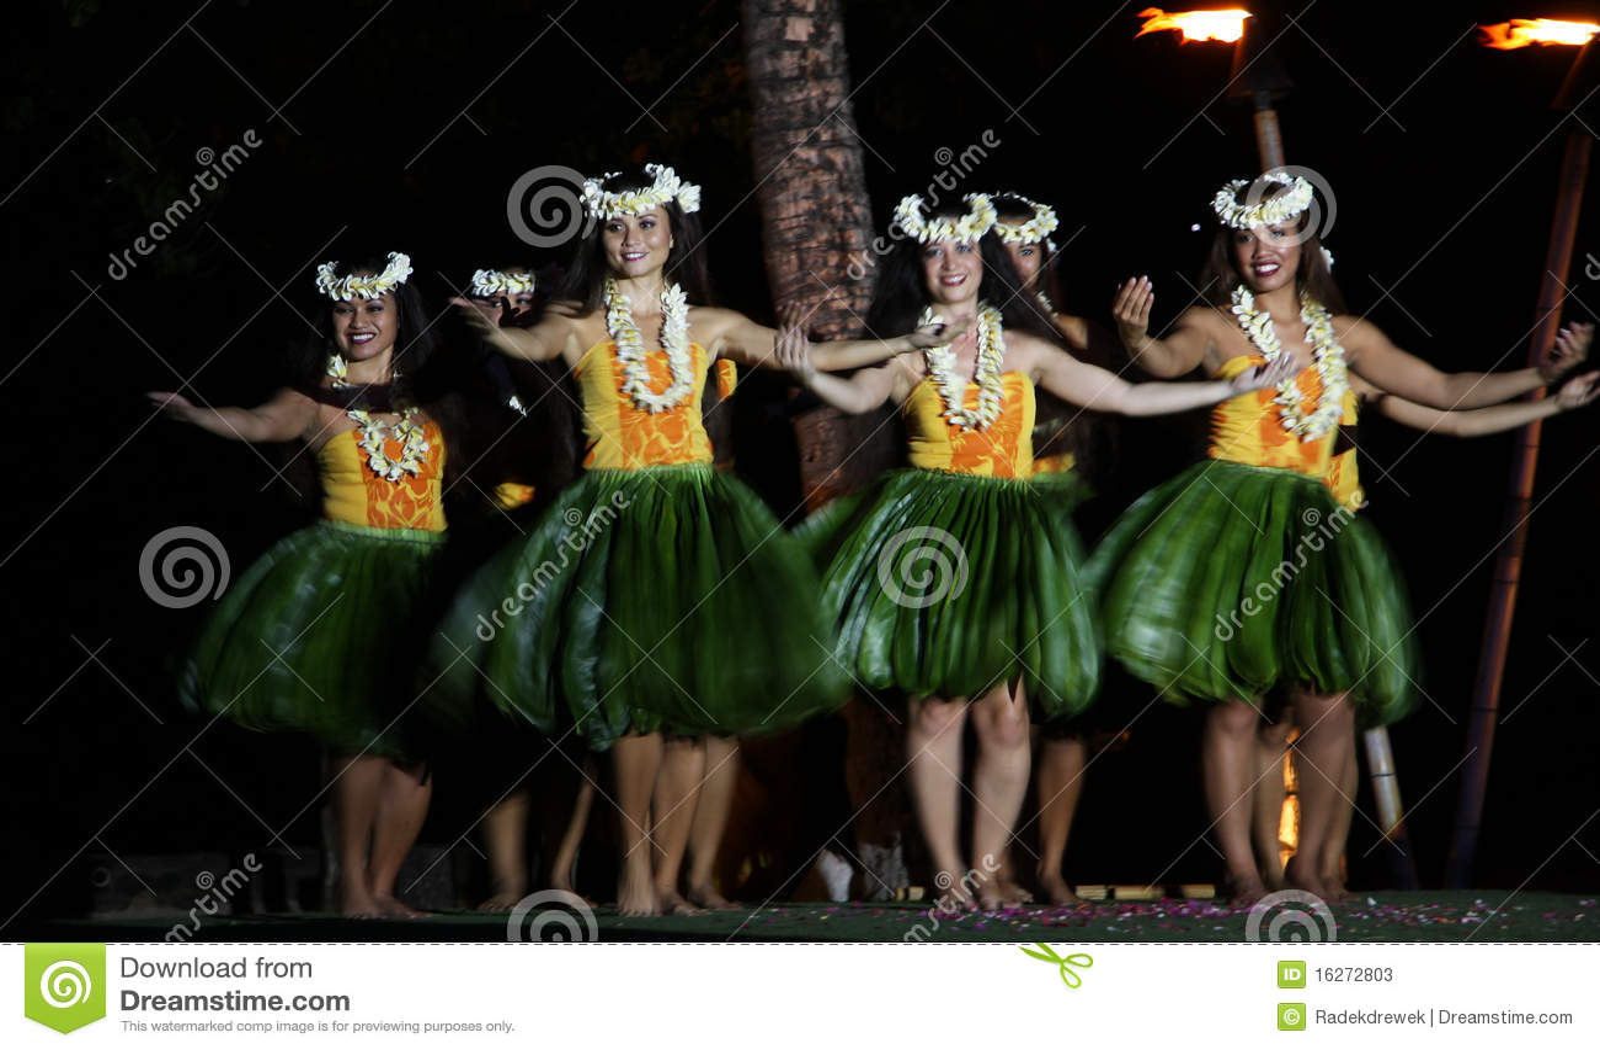 Old Lahaina Luau - Hawaii dancer